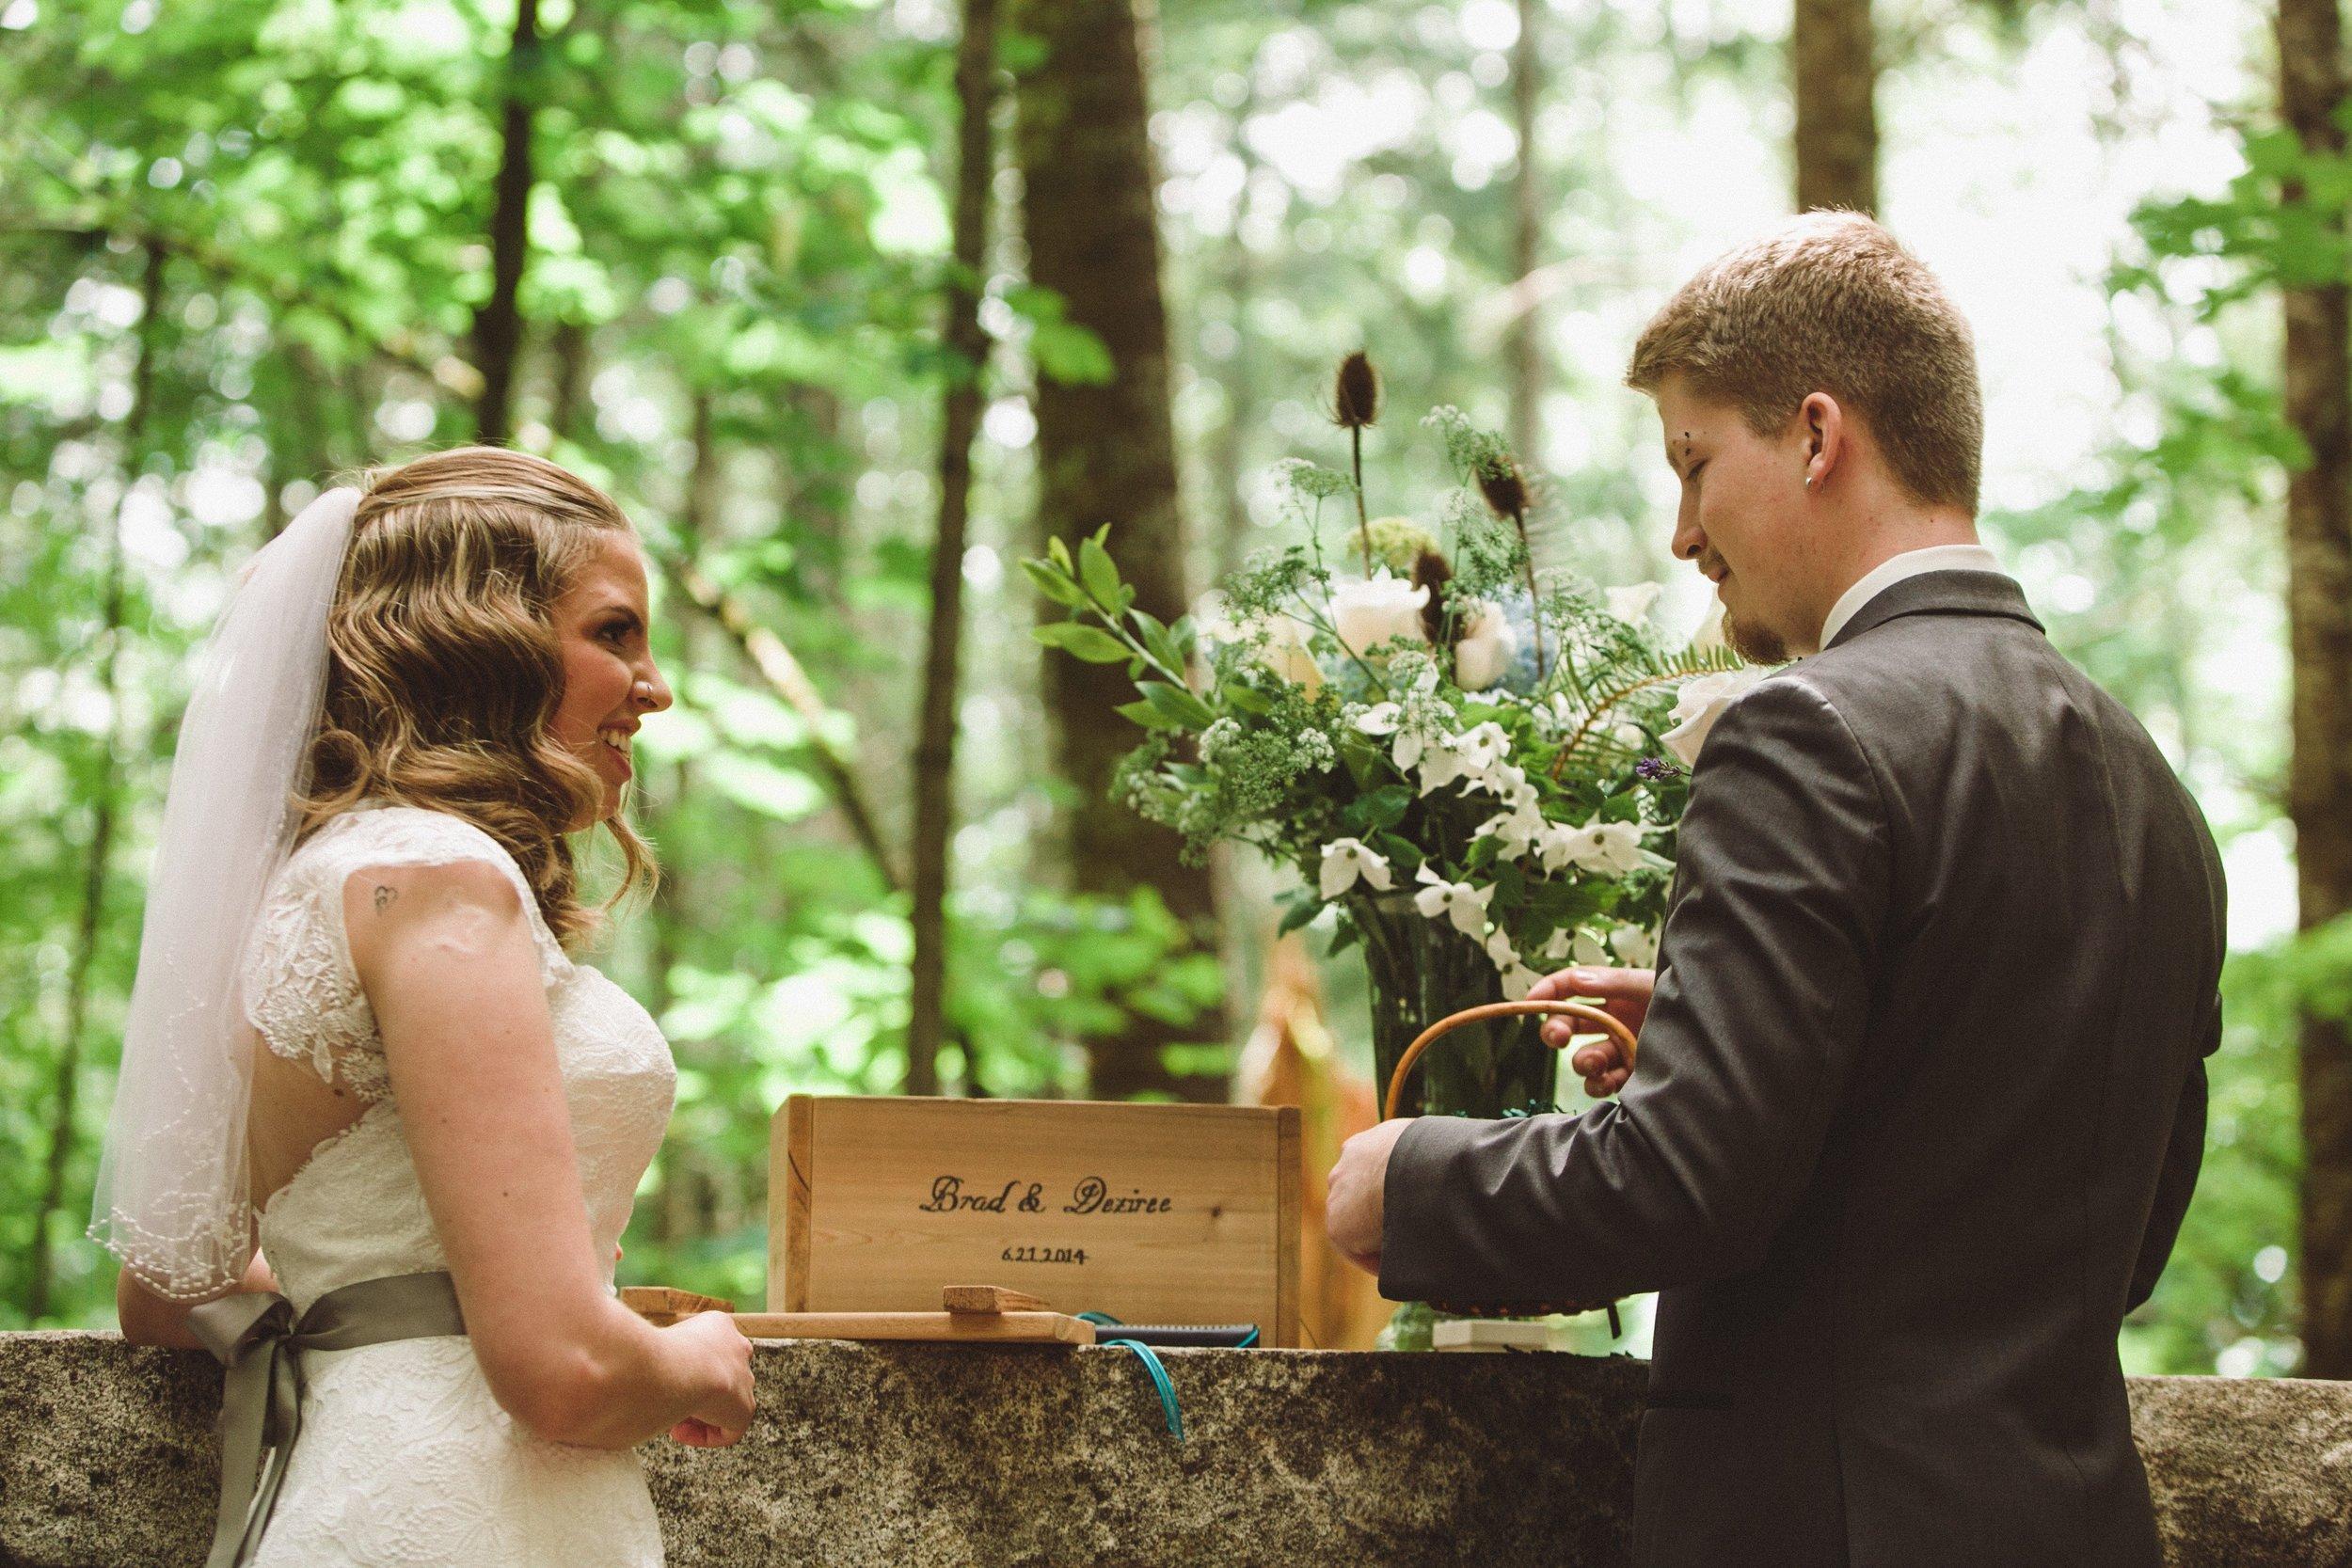 Actual wedding photo by Jenny Wohrle